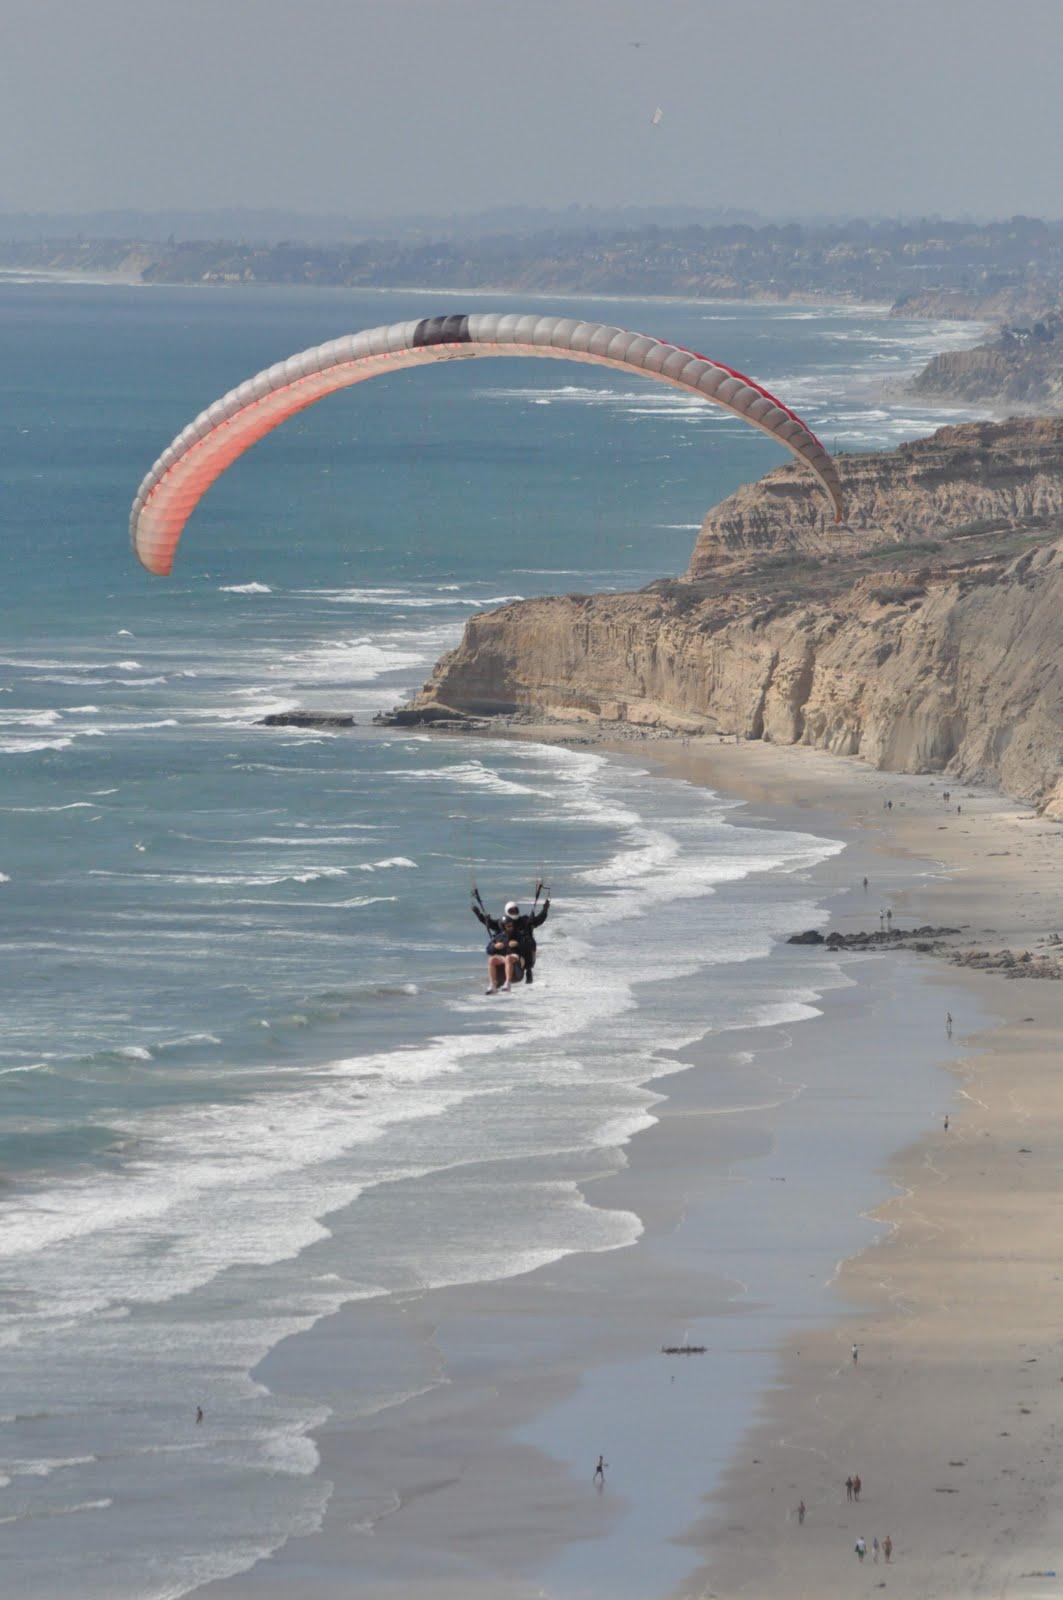 Calafia Beach Pundit: Paragliding in Torrey Pines